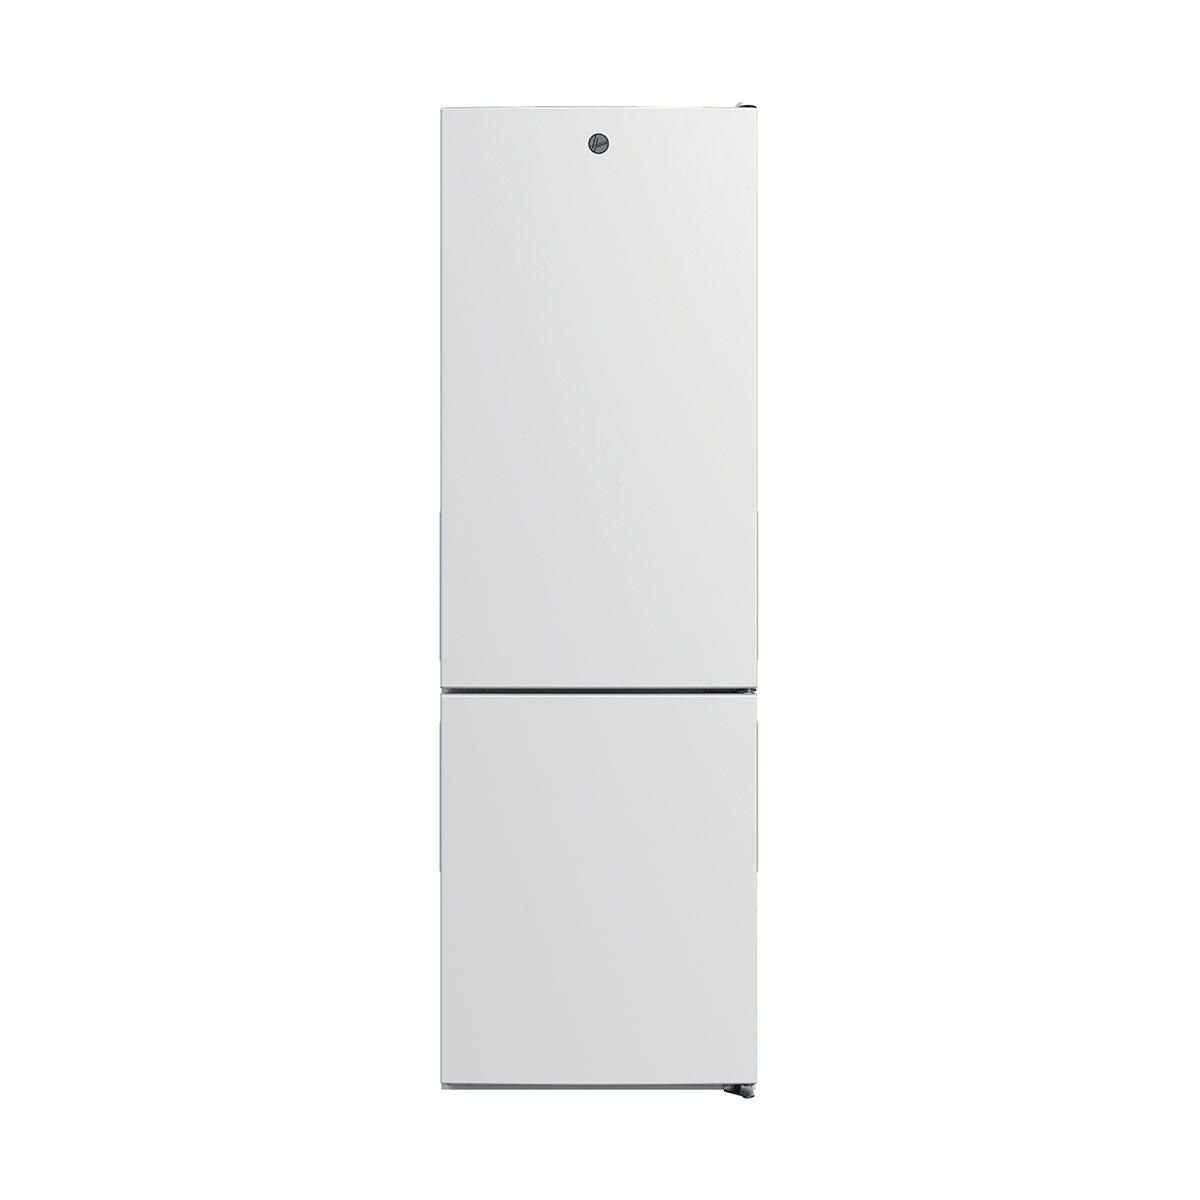 Hoover HMDNB 6184WK 60cm 302L Total No Frost Fridge Freezer - White